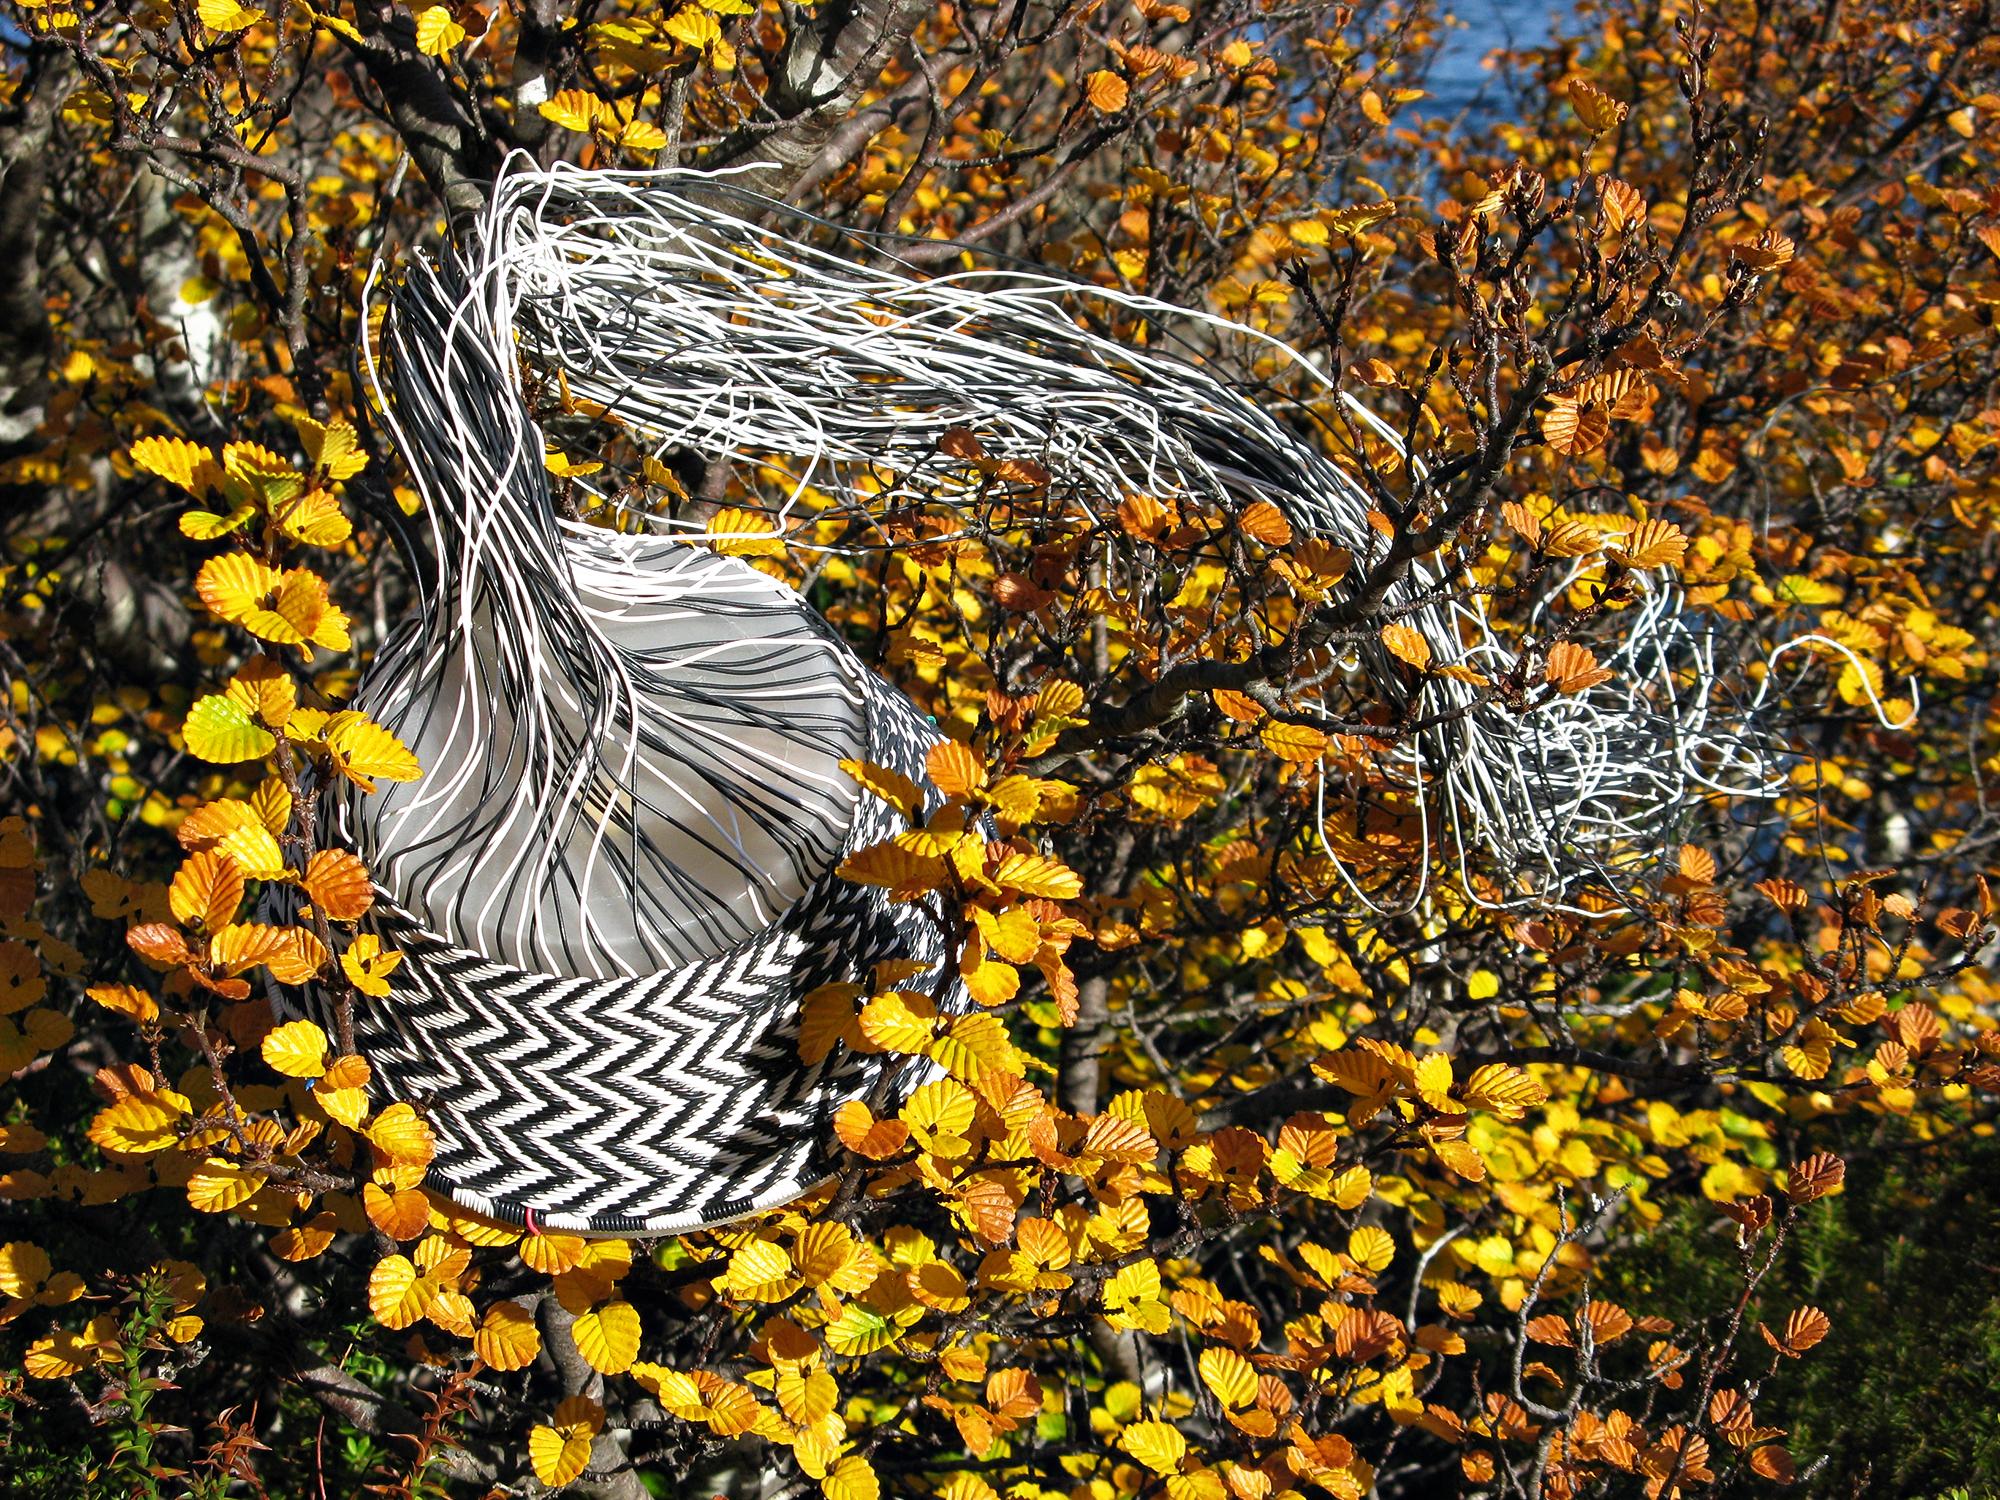 Black and white chevron wire basket in progress, nestled amongst the golden orange autumn foliage of Tasmania's deciduous beech.